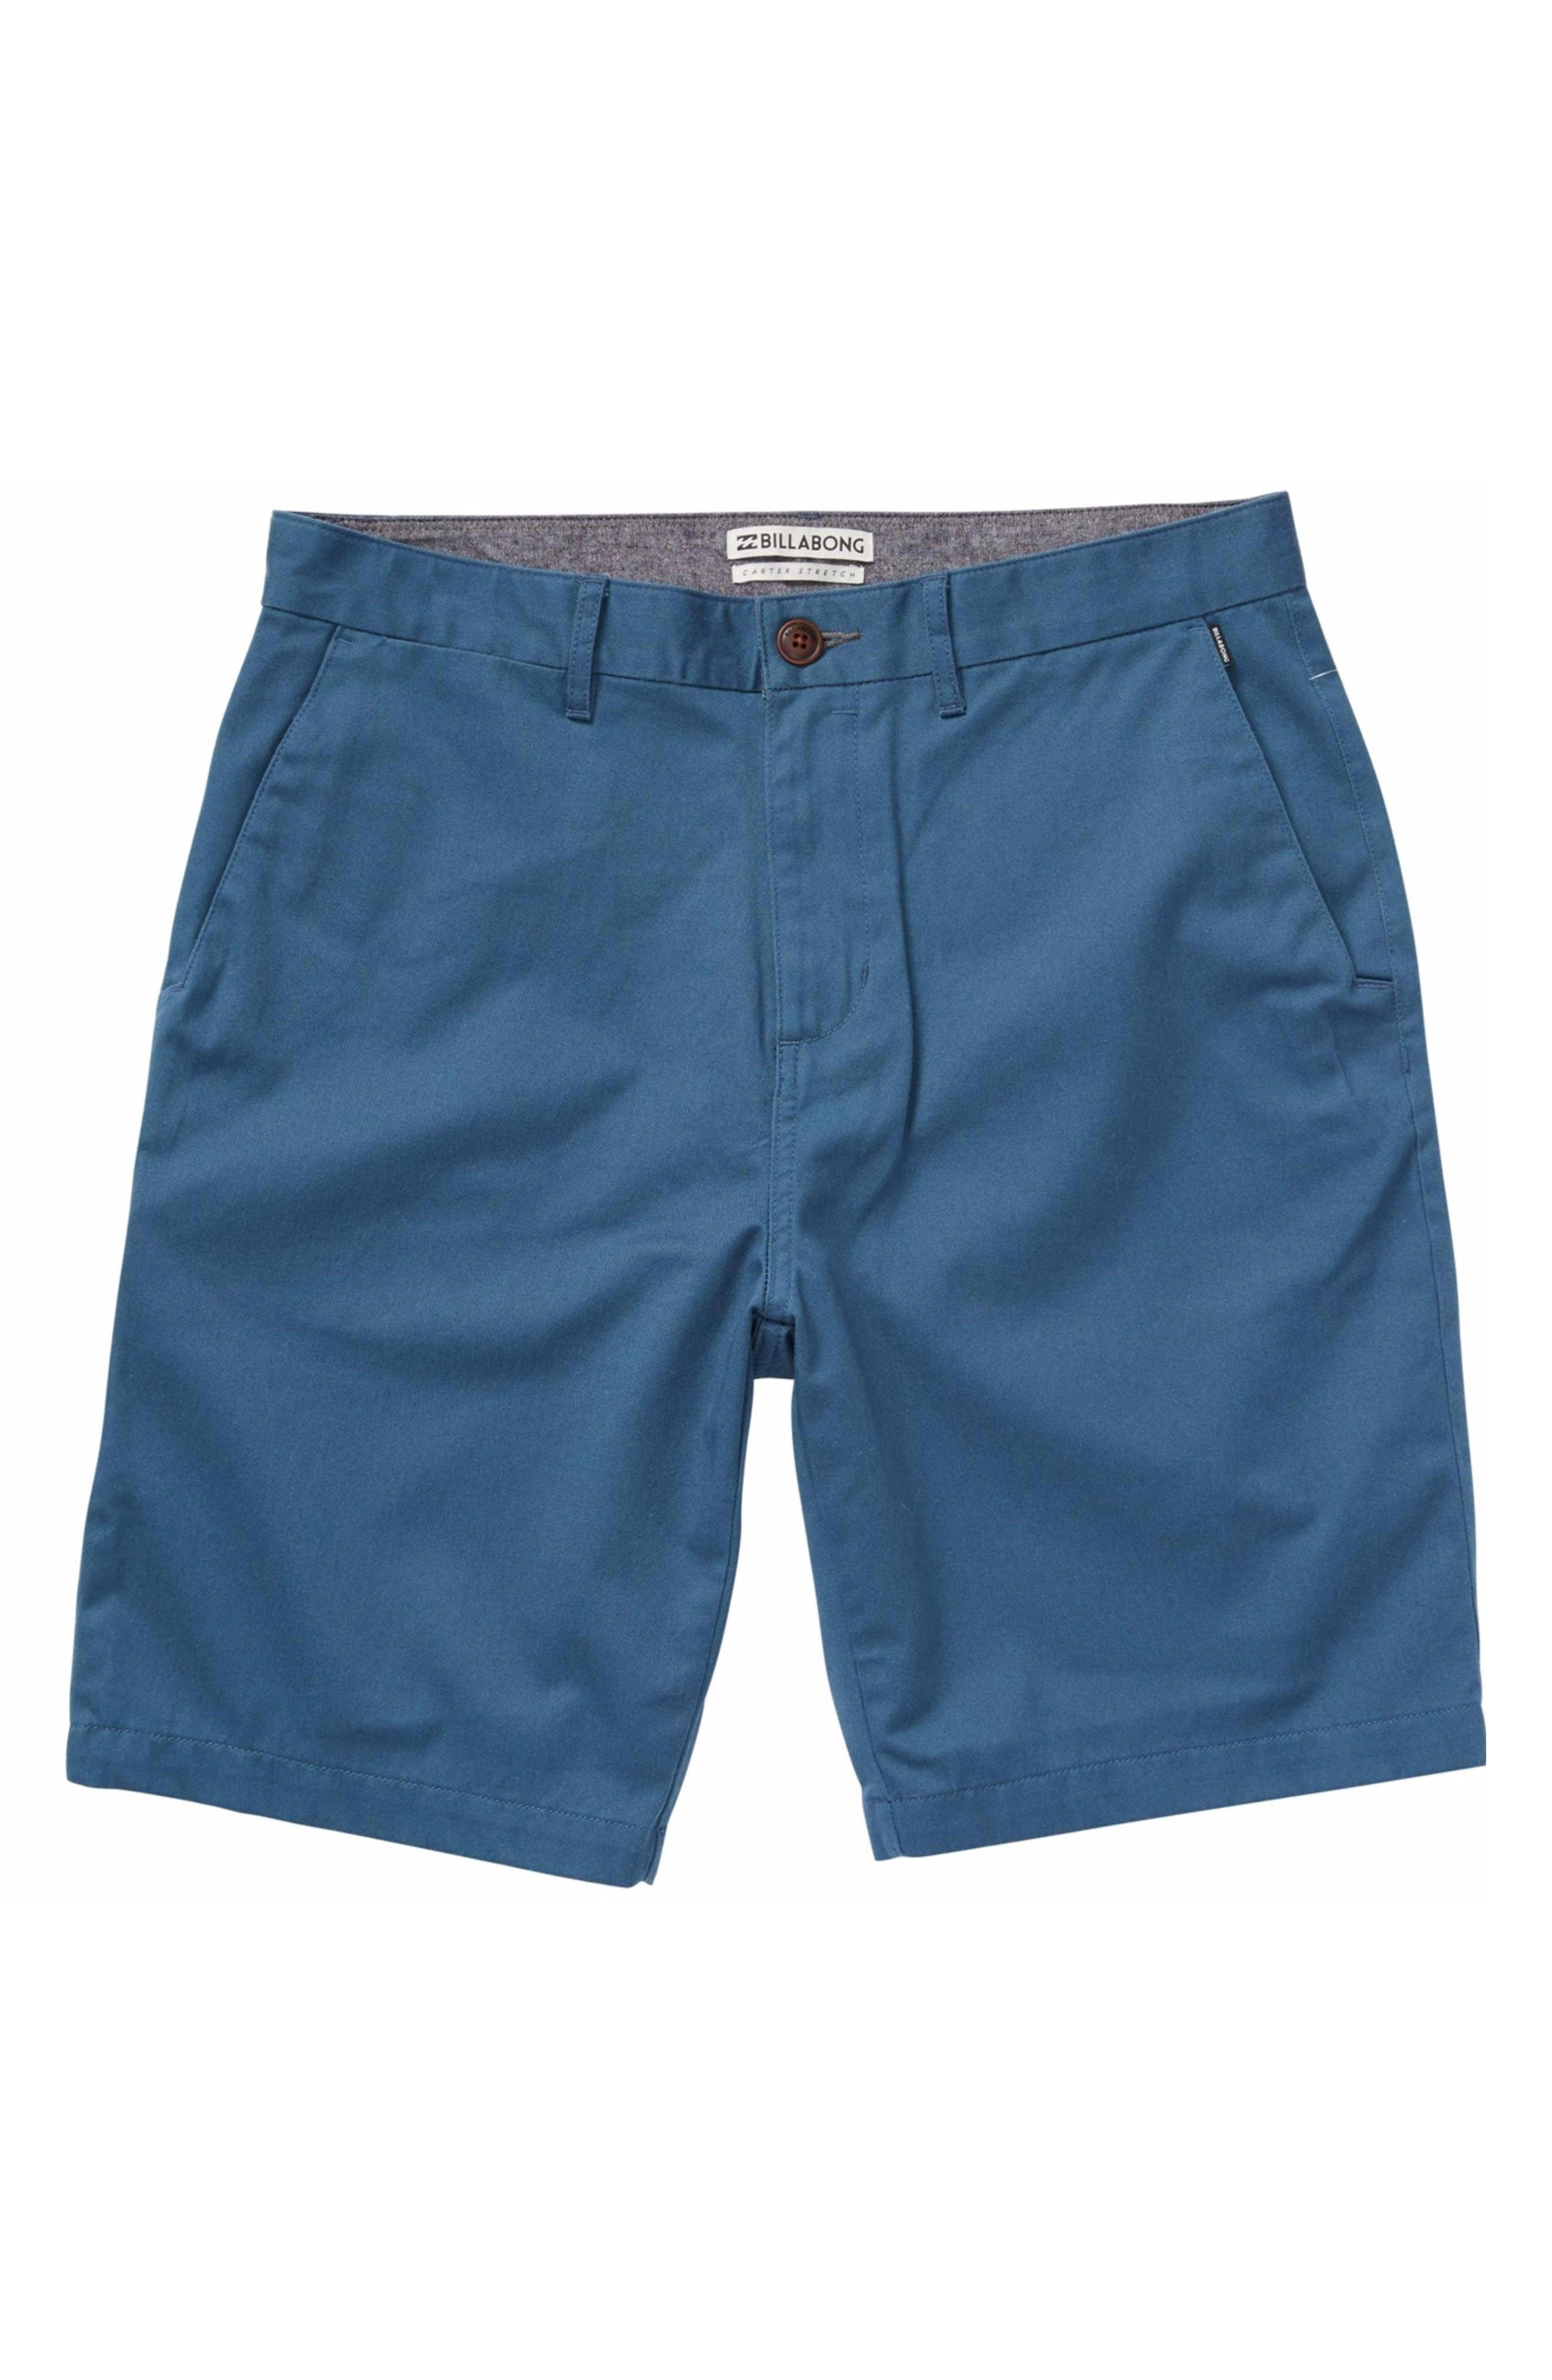 'Carter' Cotton Twill Shorts,                         Main,                         color, Harbor Blue